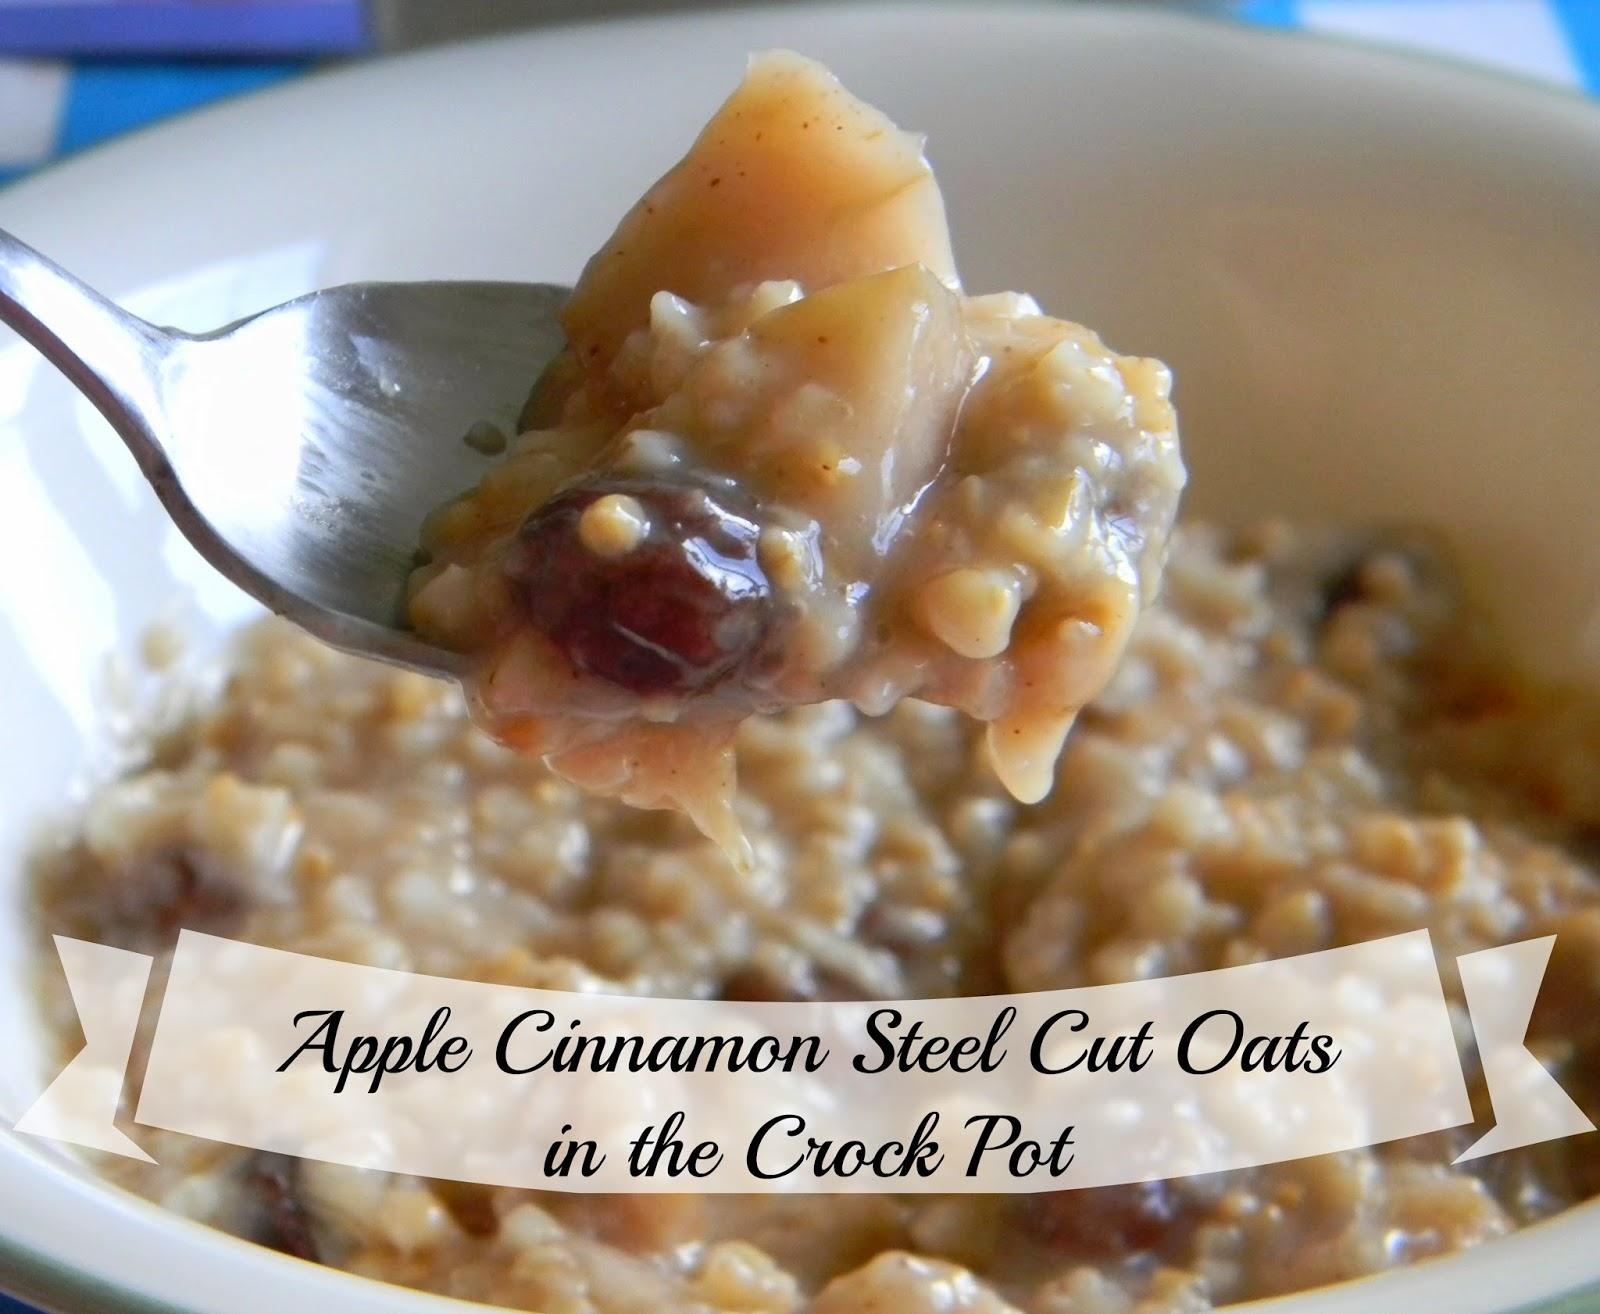 http://pinspiredhome.blogspot.com/2014/05/apple-cinnamon-steel-cut-oats-in-crock.html